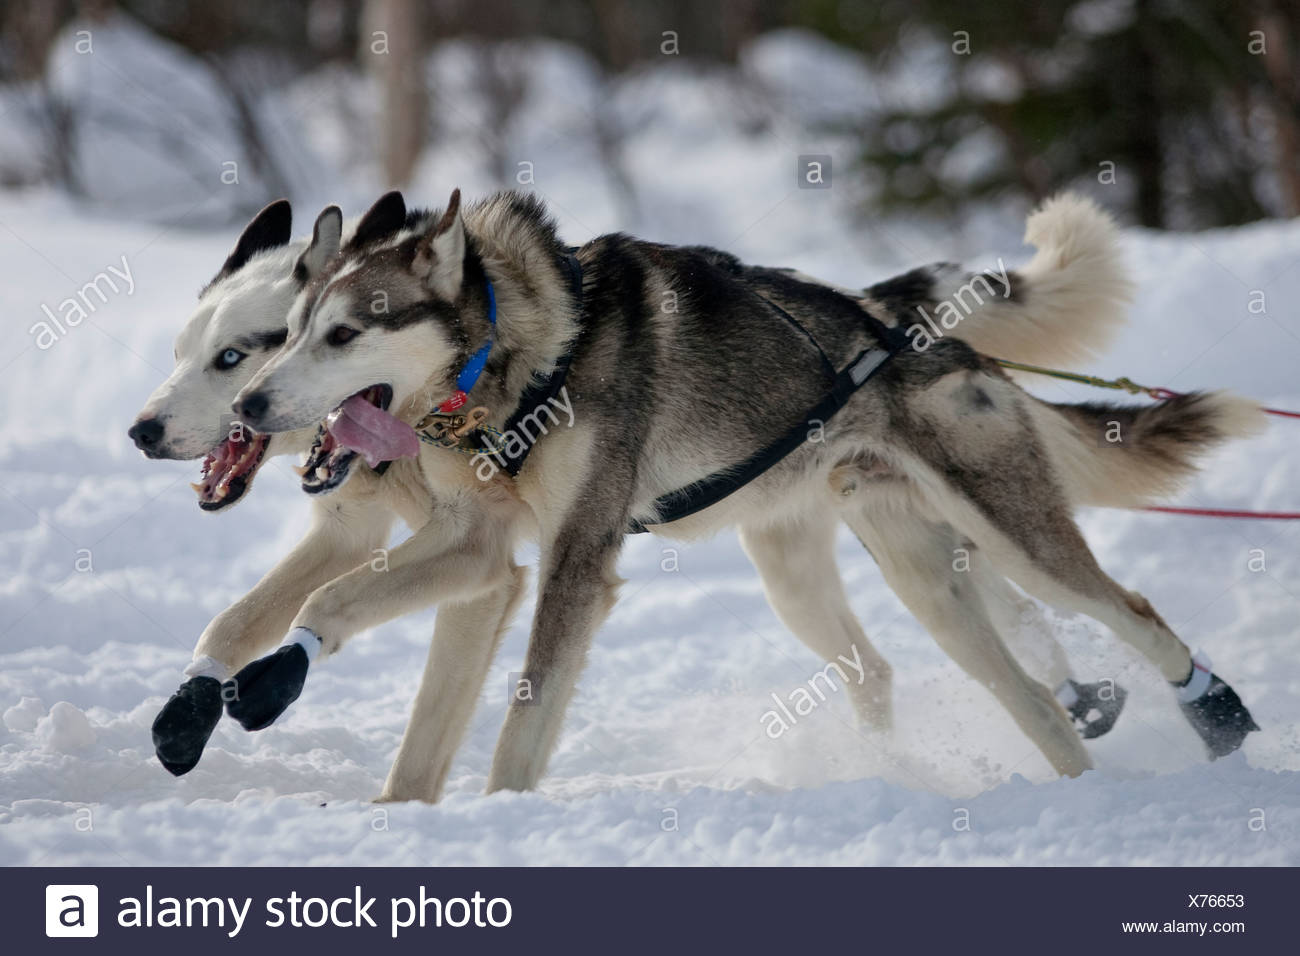 Alaska, Willow. Sentiero Iditarod Sled Dog Race 2009 Gazzetta re-start. Mushers sul lungo lago. Immagini Stock